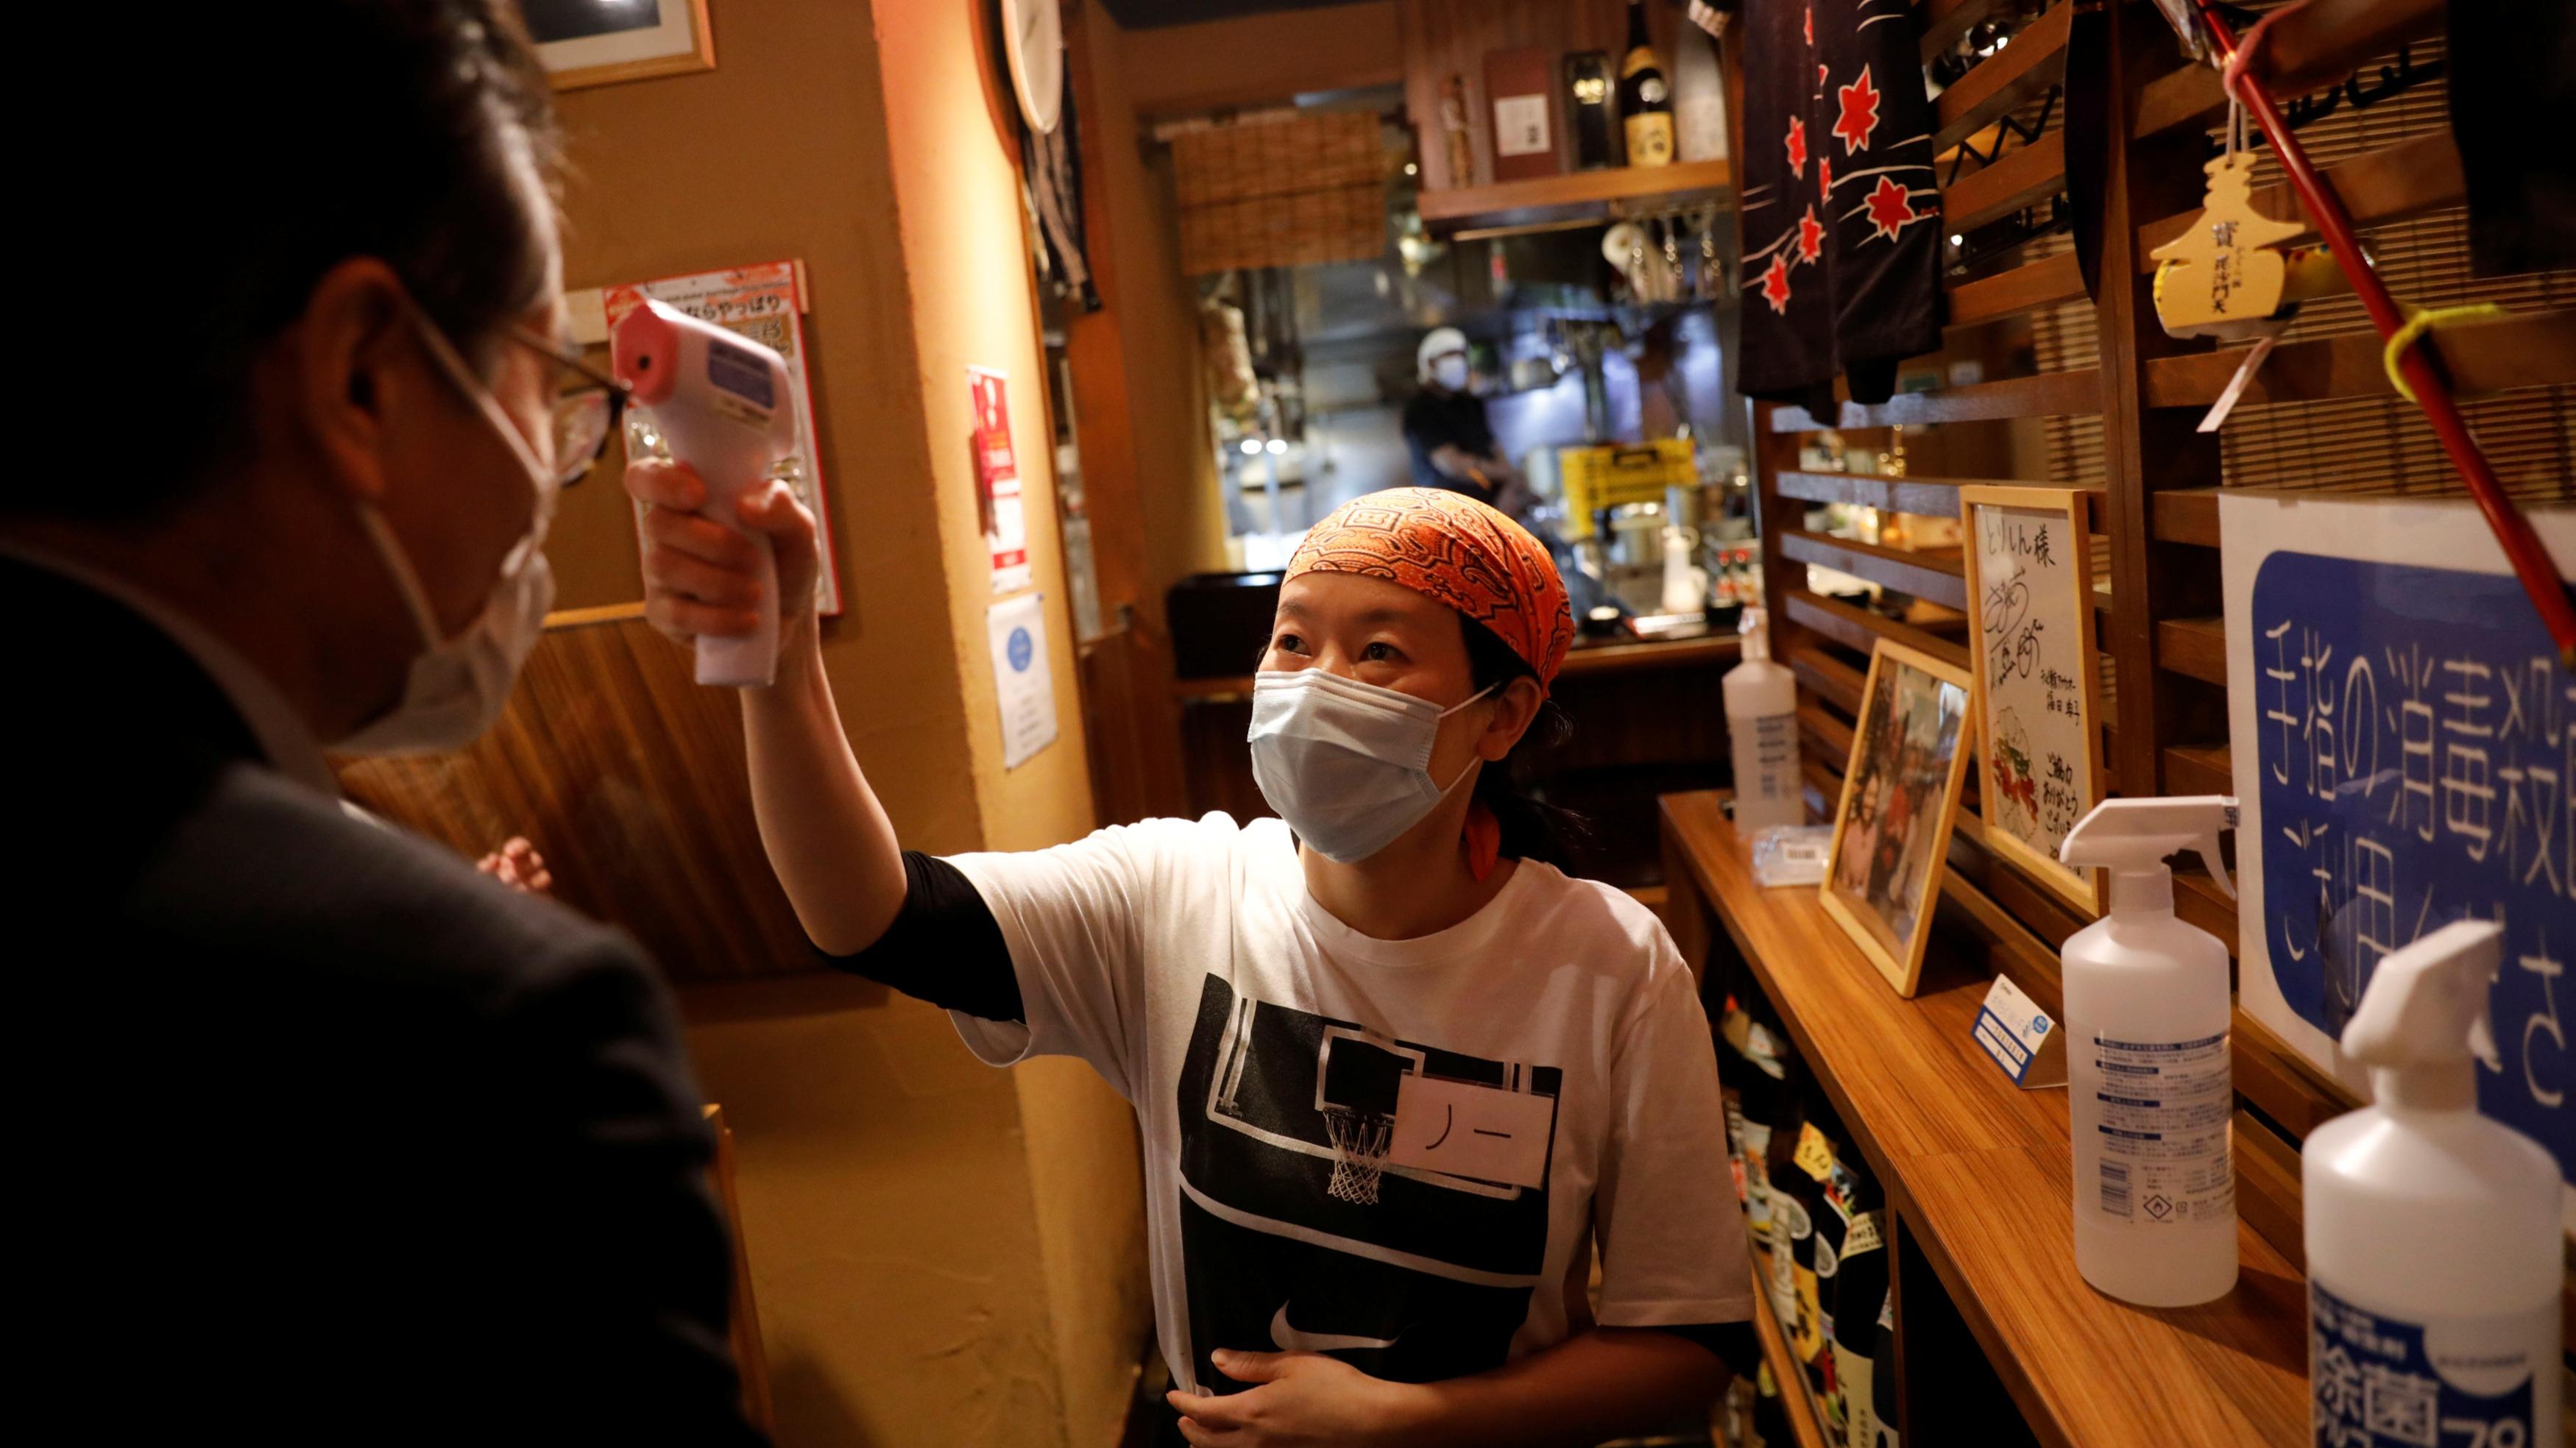 Tokyo asks restaurants, bars to shut early as virus spikes